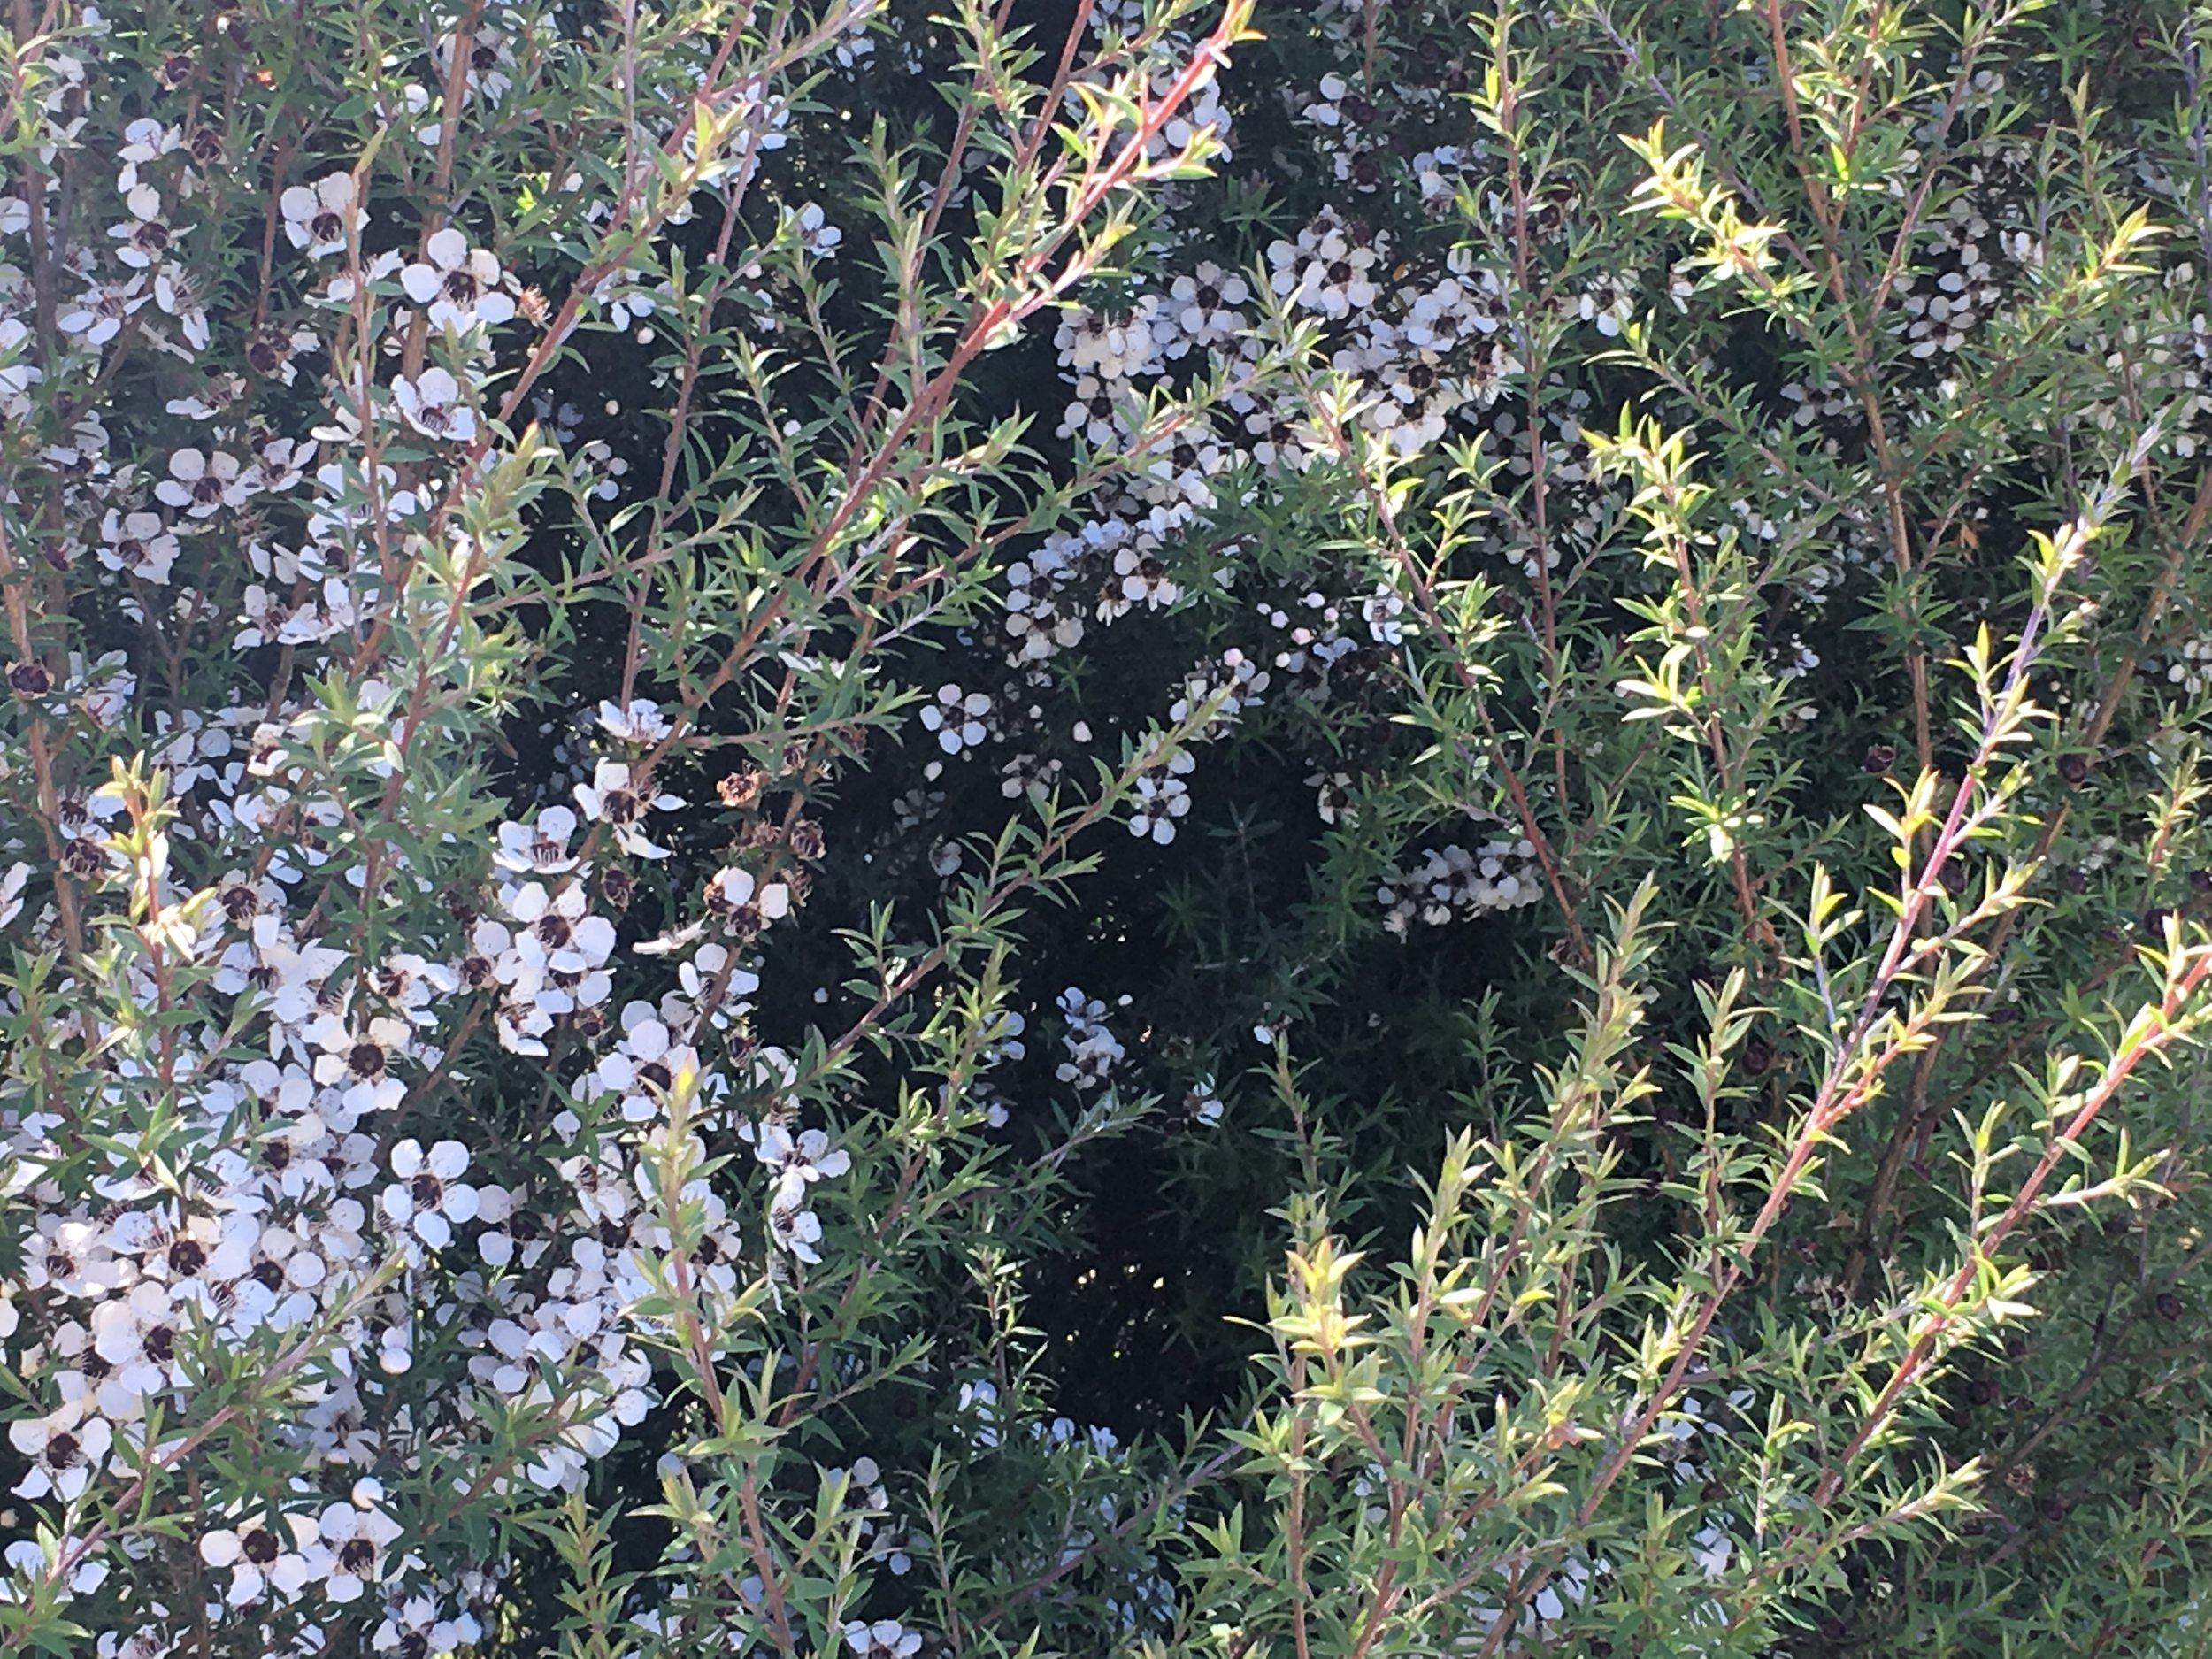 Manuka trees just starting to flower